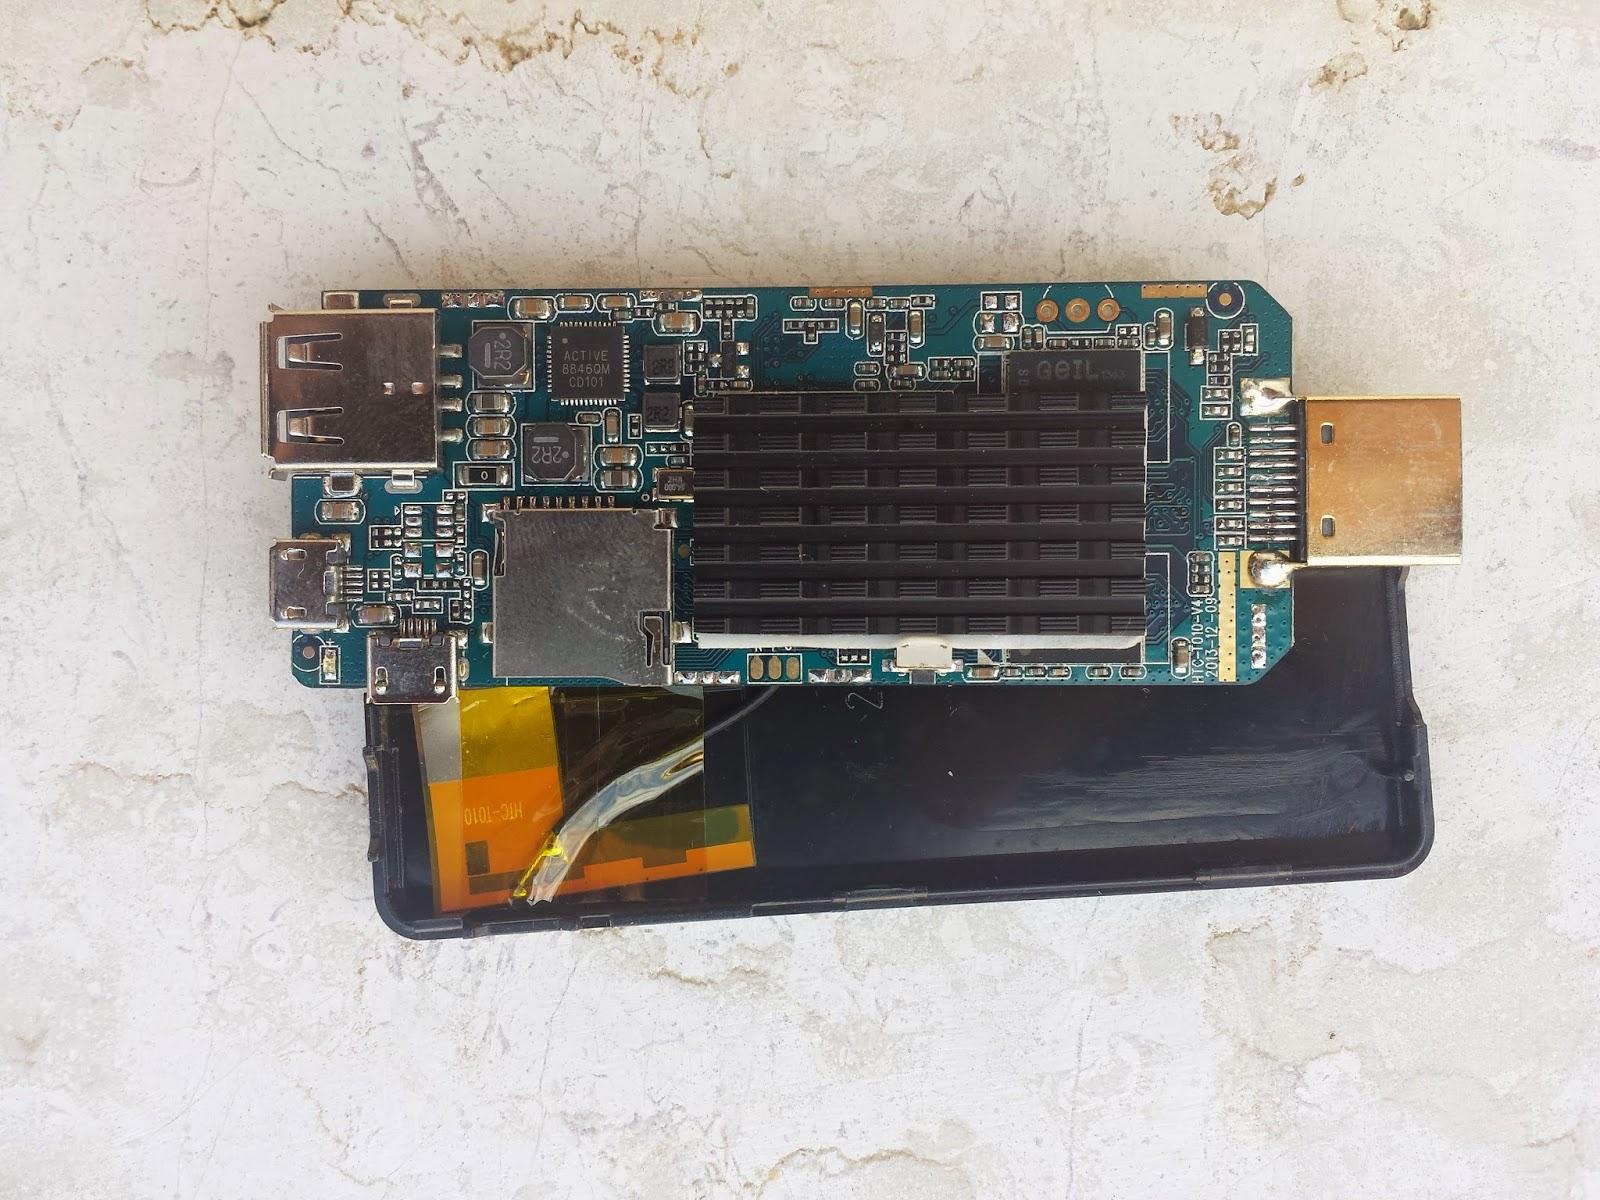 MK809III wifi not working after custom rom - FreakTab